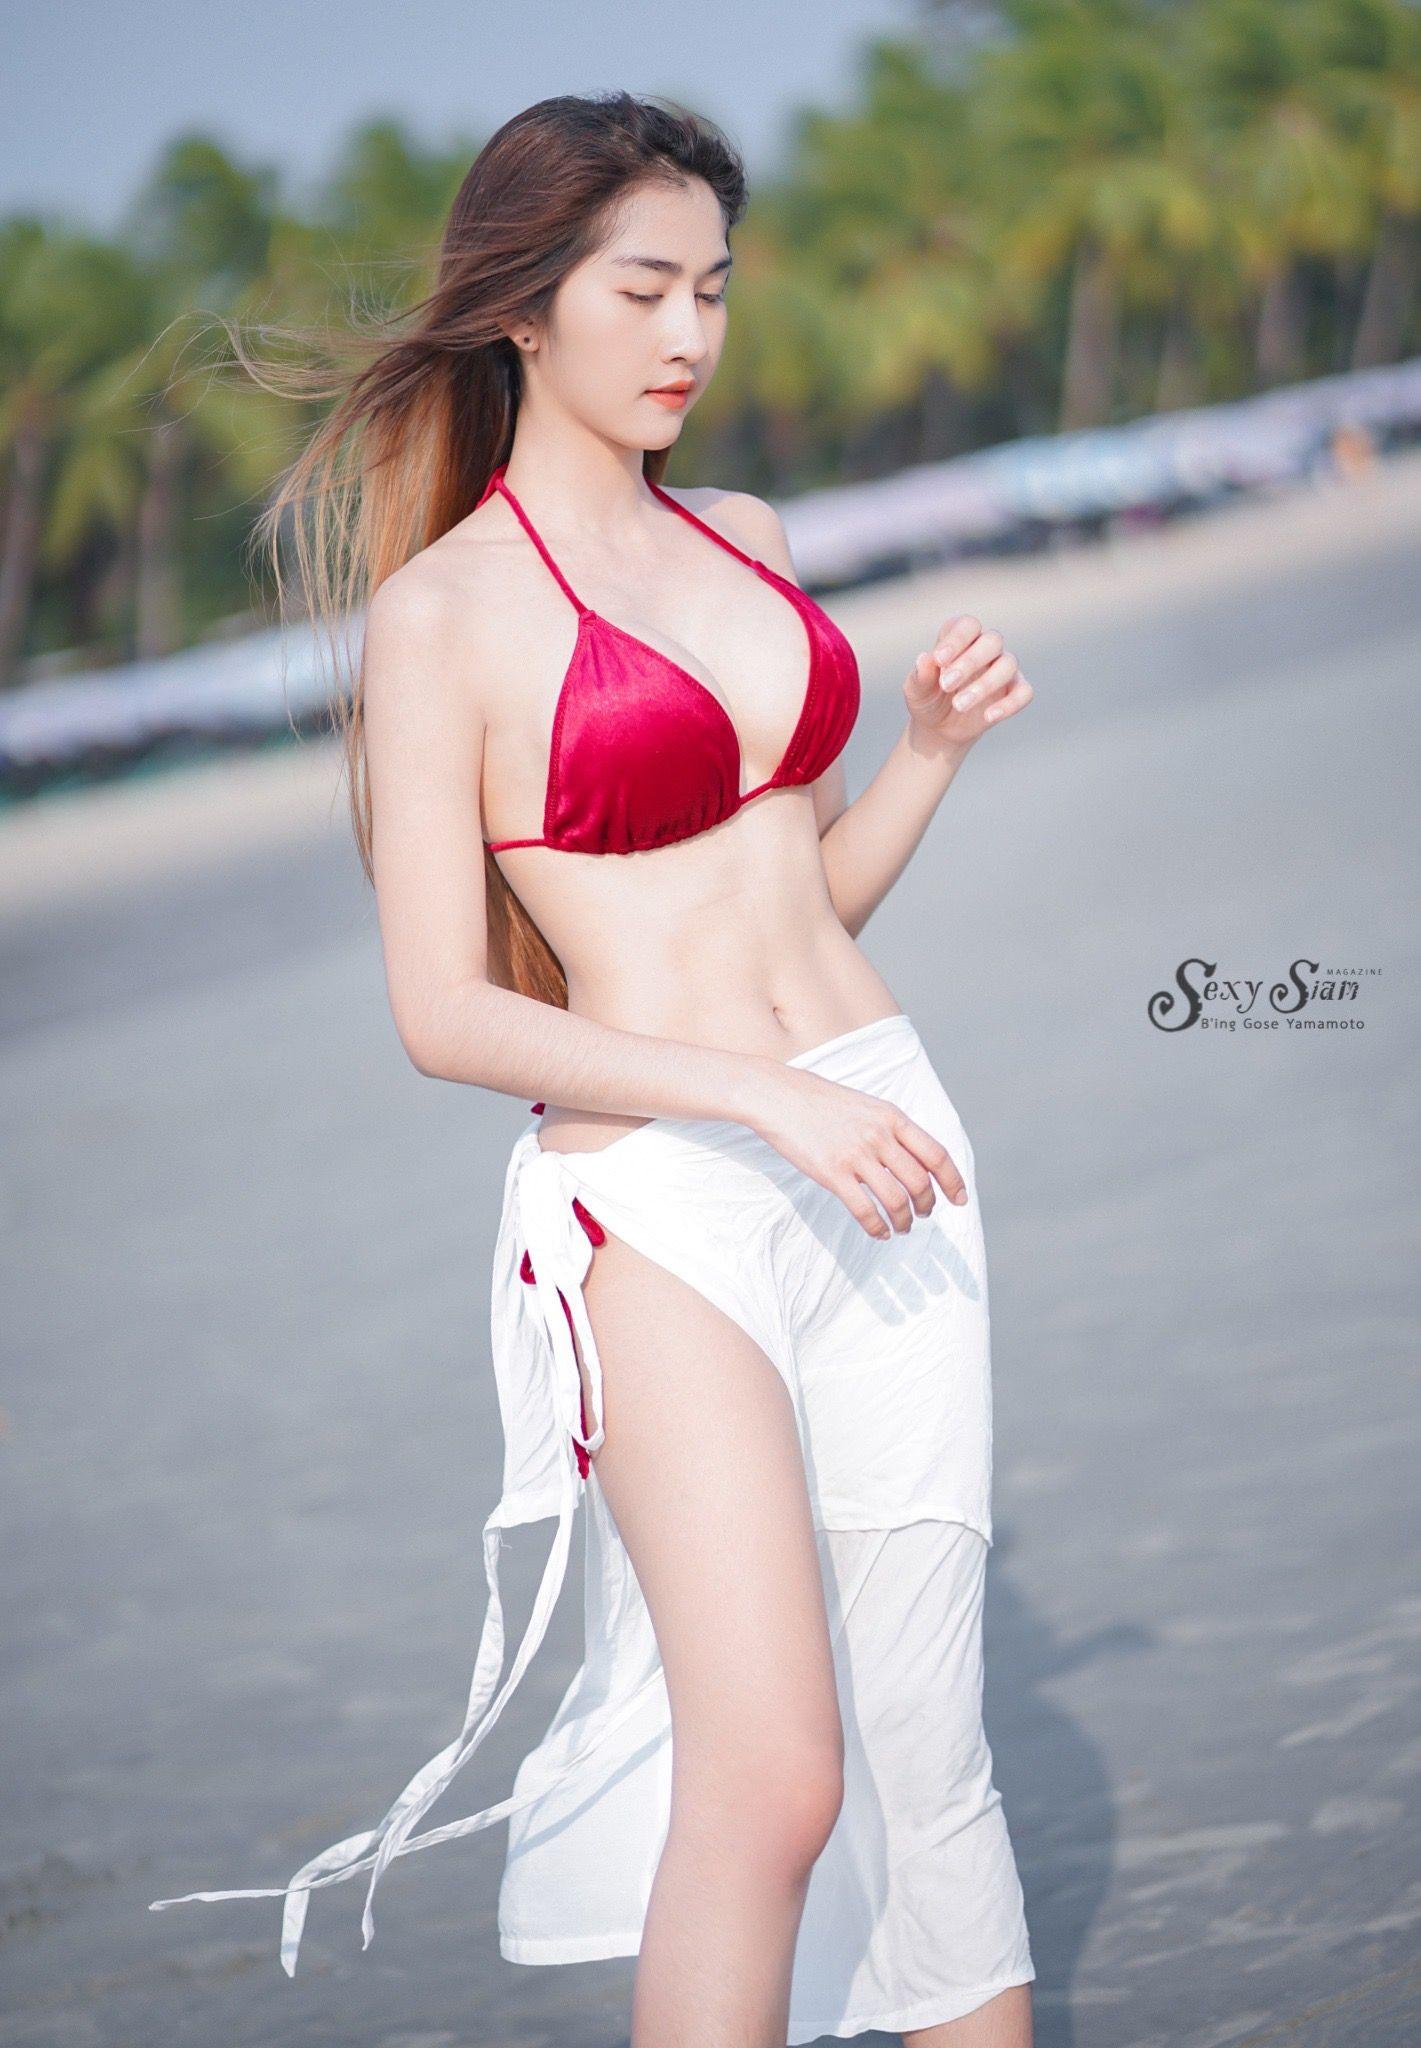 Very Beautiful Young Girl